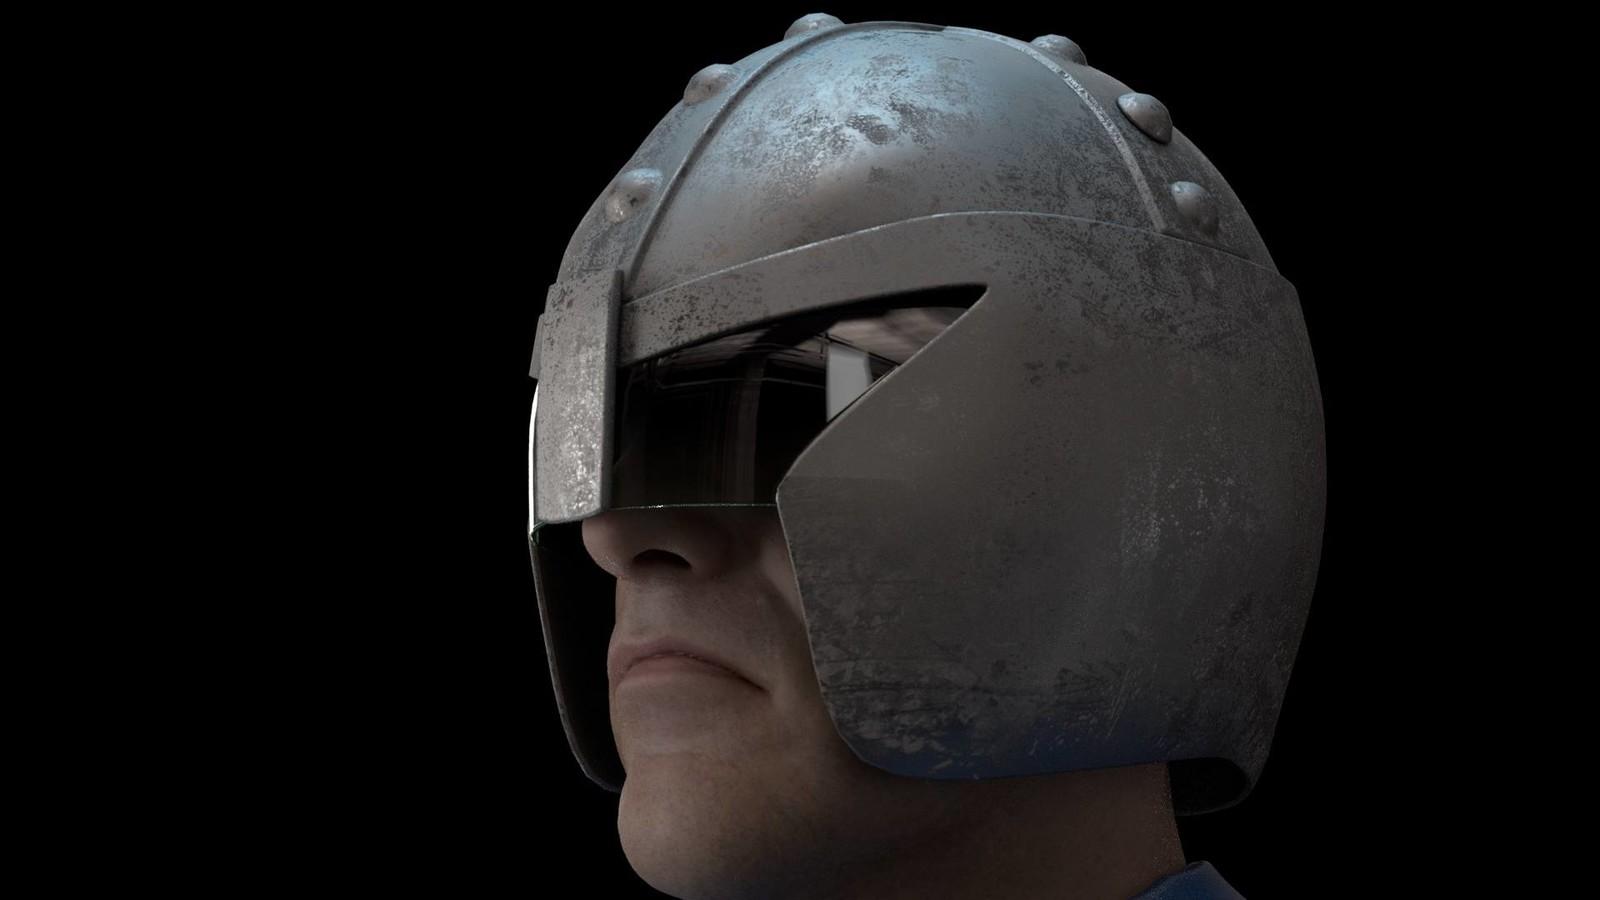 Cal-Hab Judge Helmet based on a design by John Ridgway (Head sculpt by Ten24)